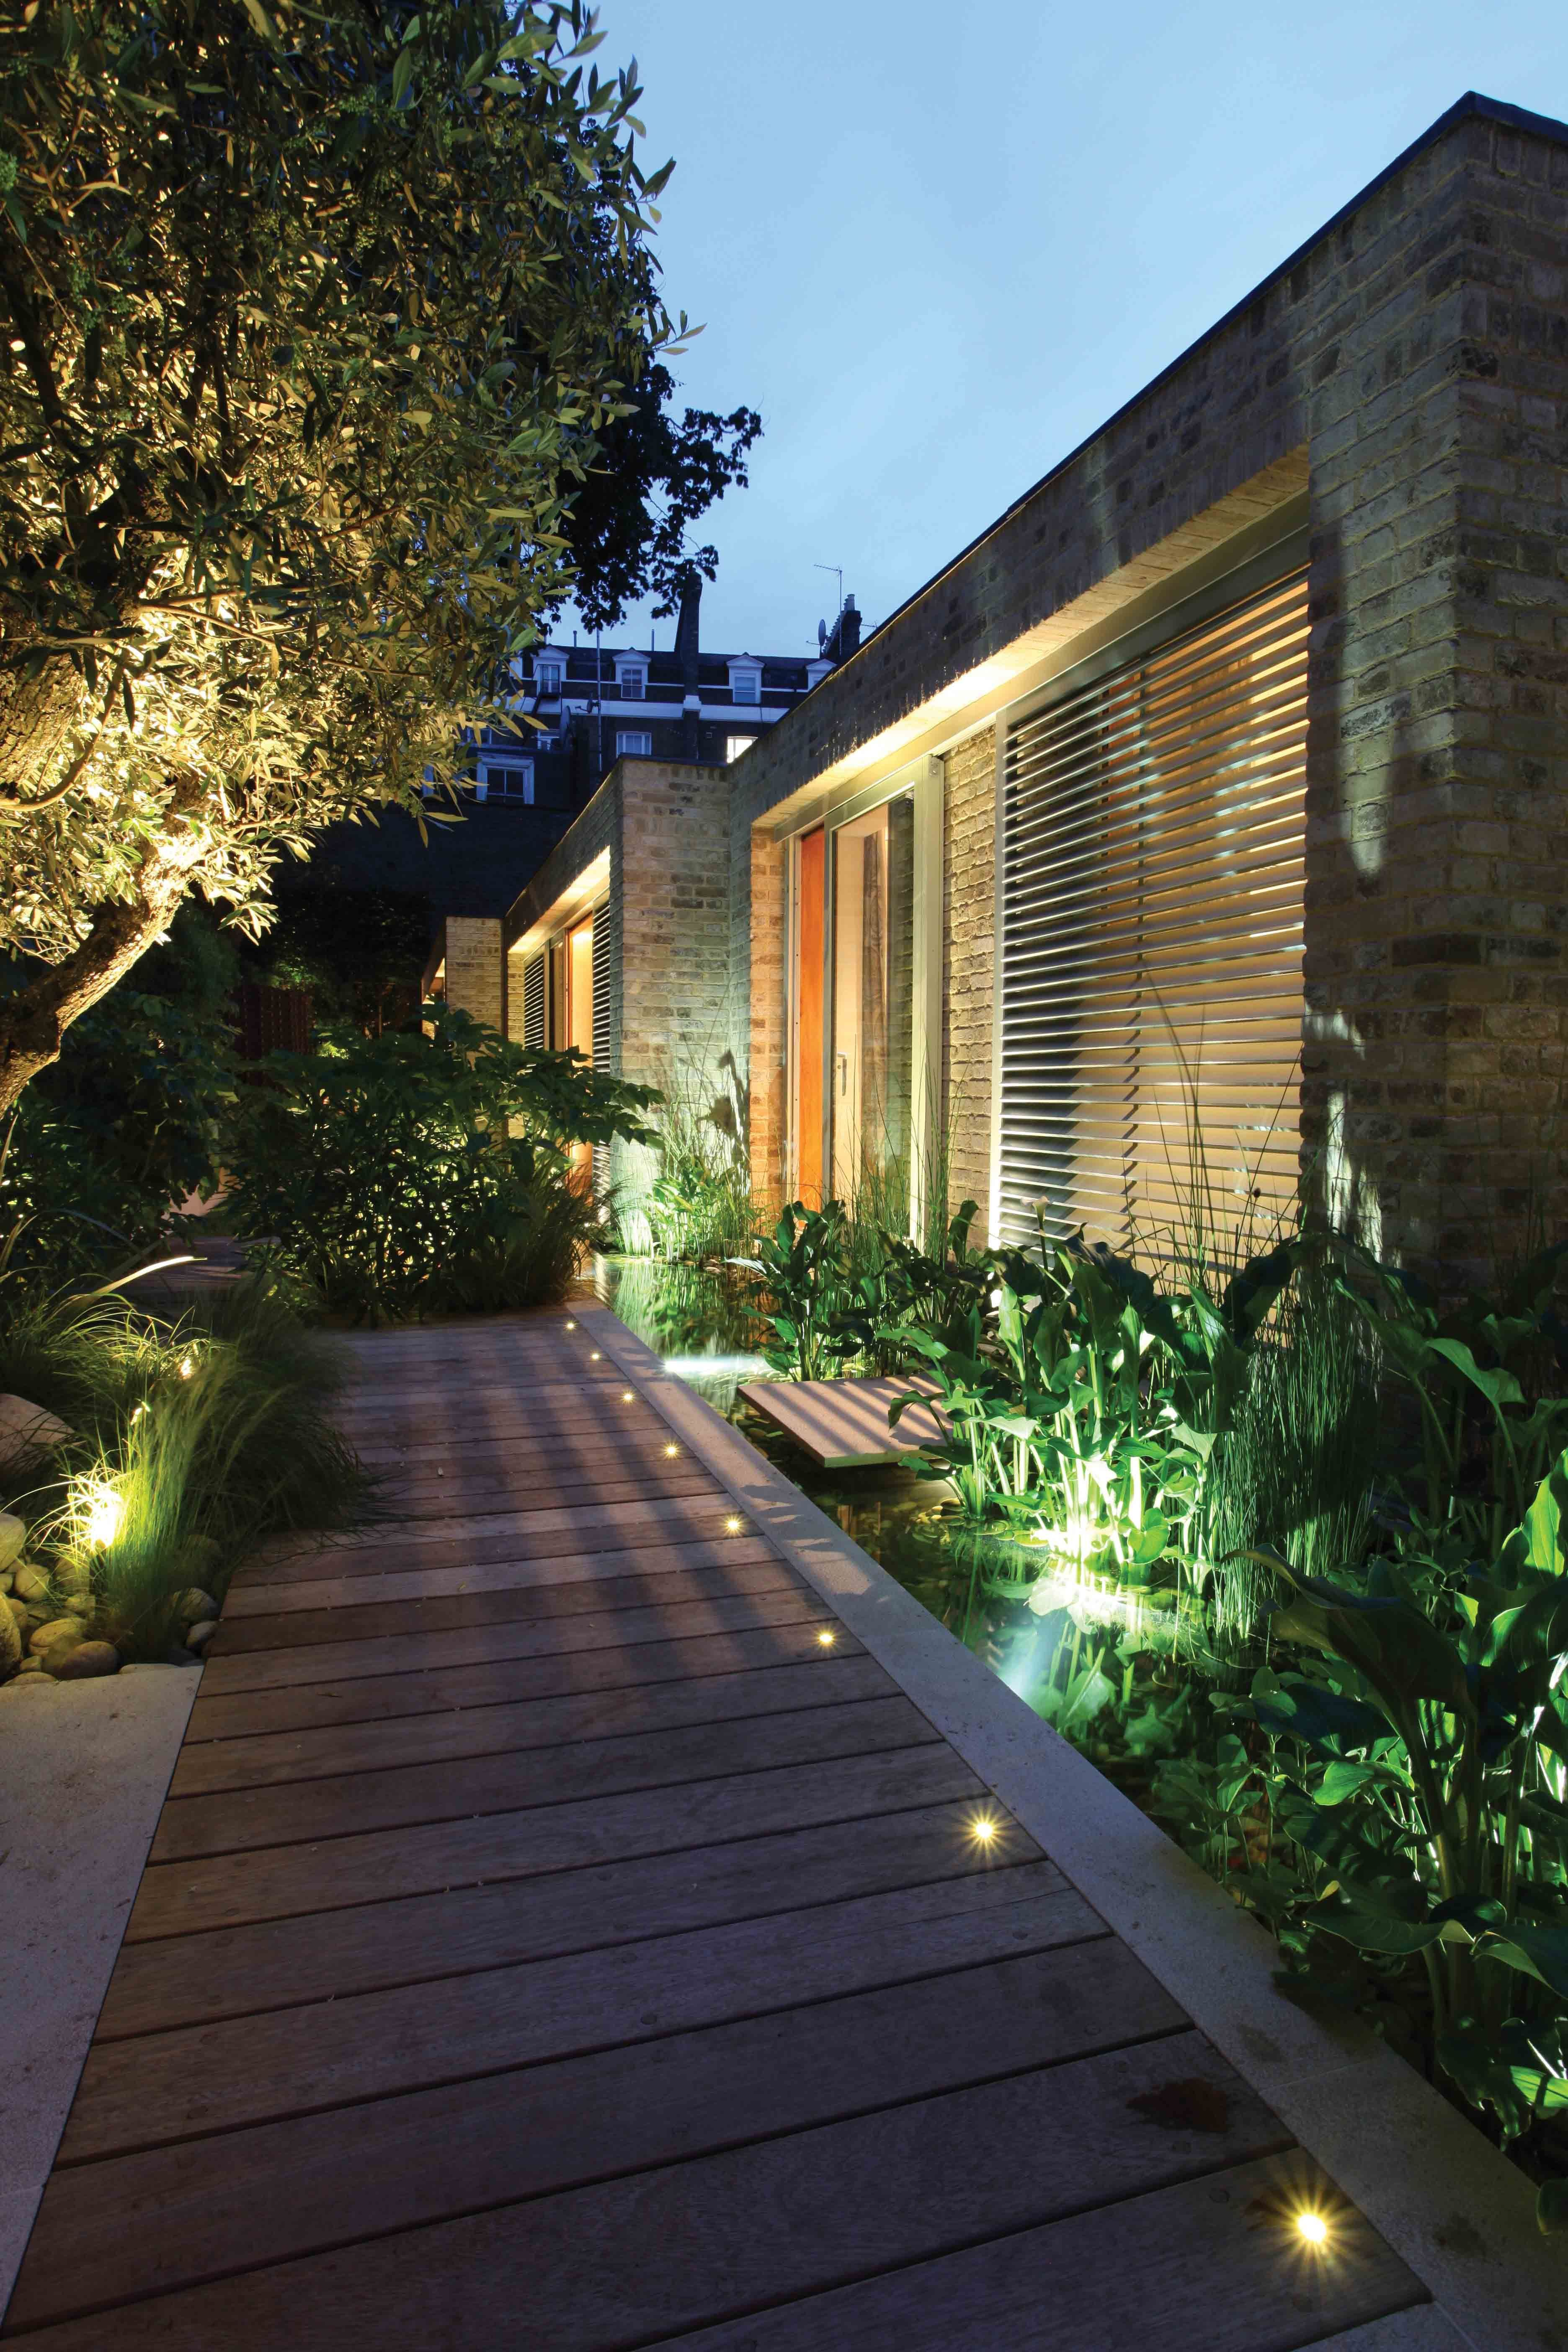 Outdoor Lighting Ideas For Patio Be Honest Selecting The Right Outdoor Lighting Ideas For Garden Lighting Design Landscape Lighting Design Outdoor Lighting